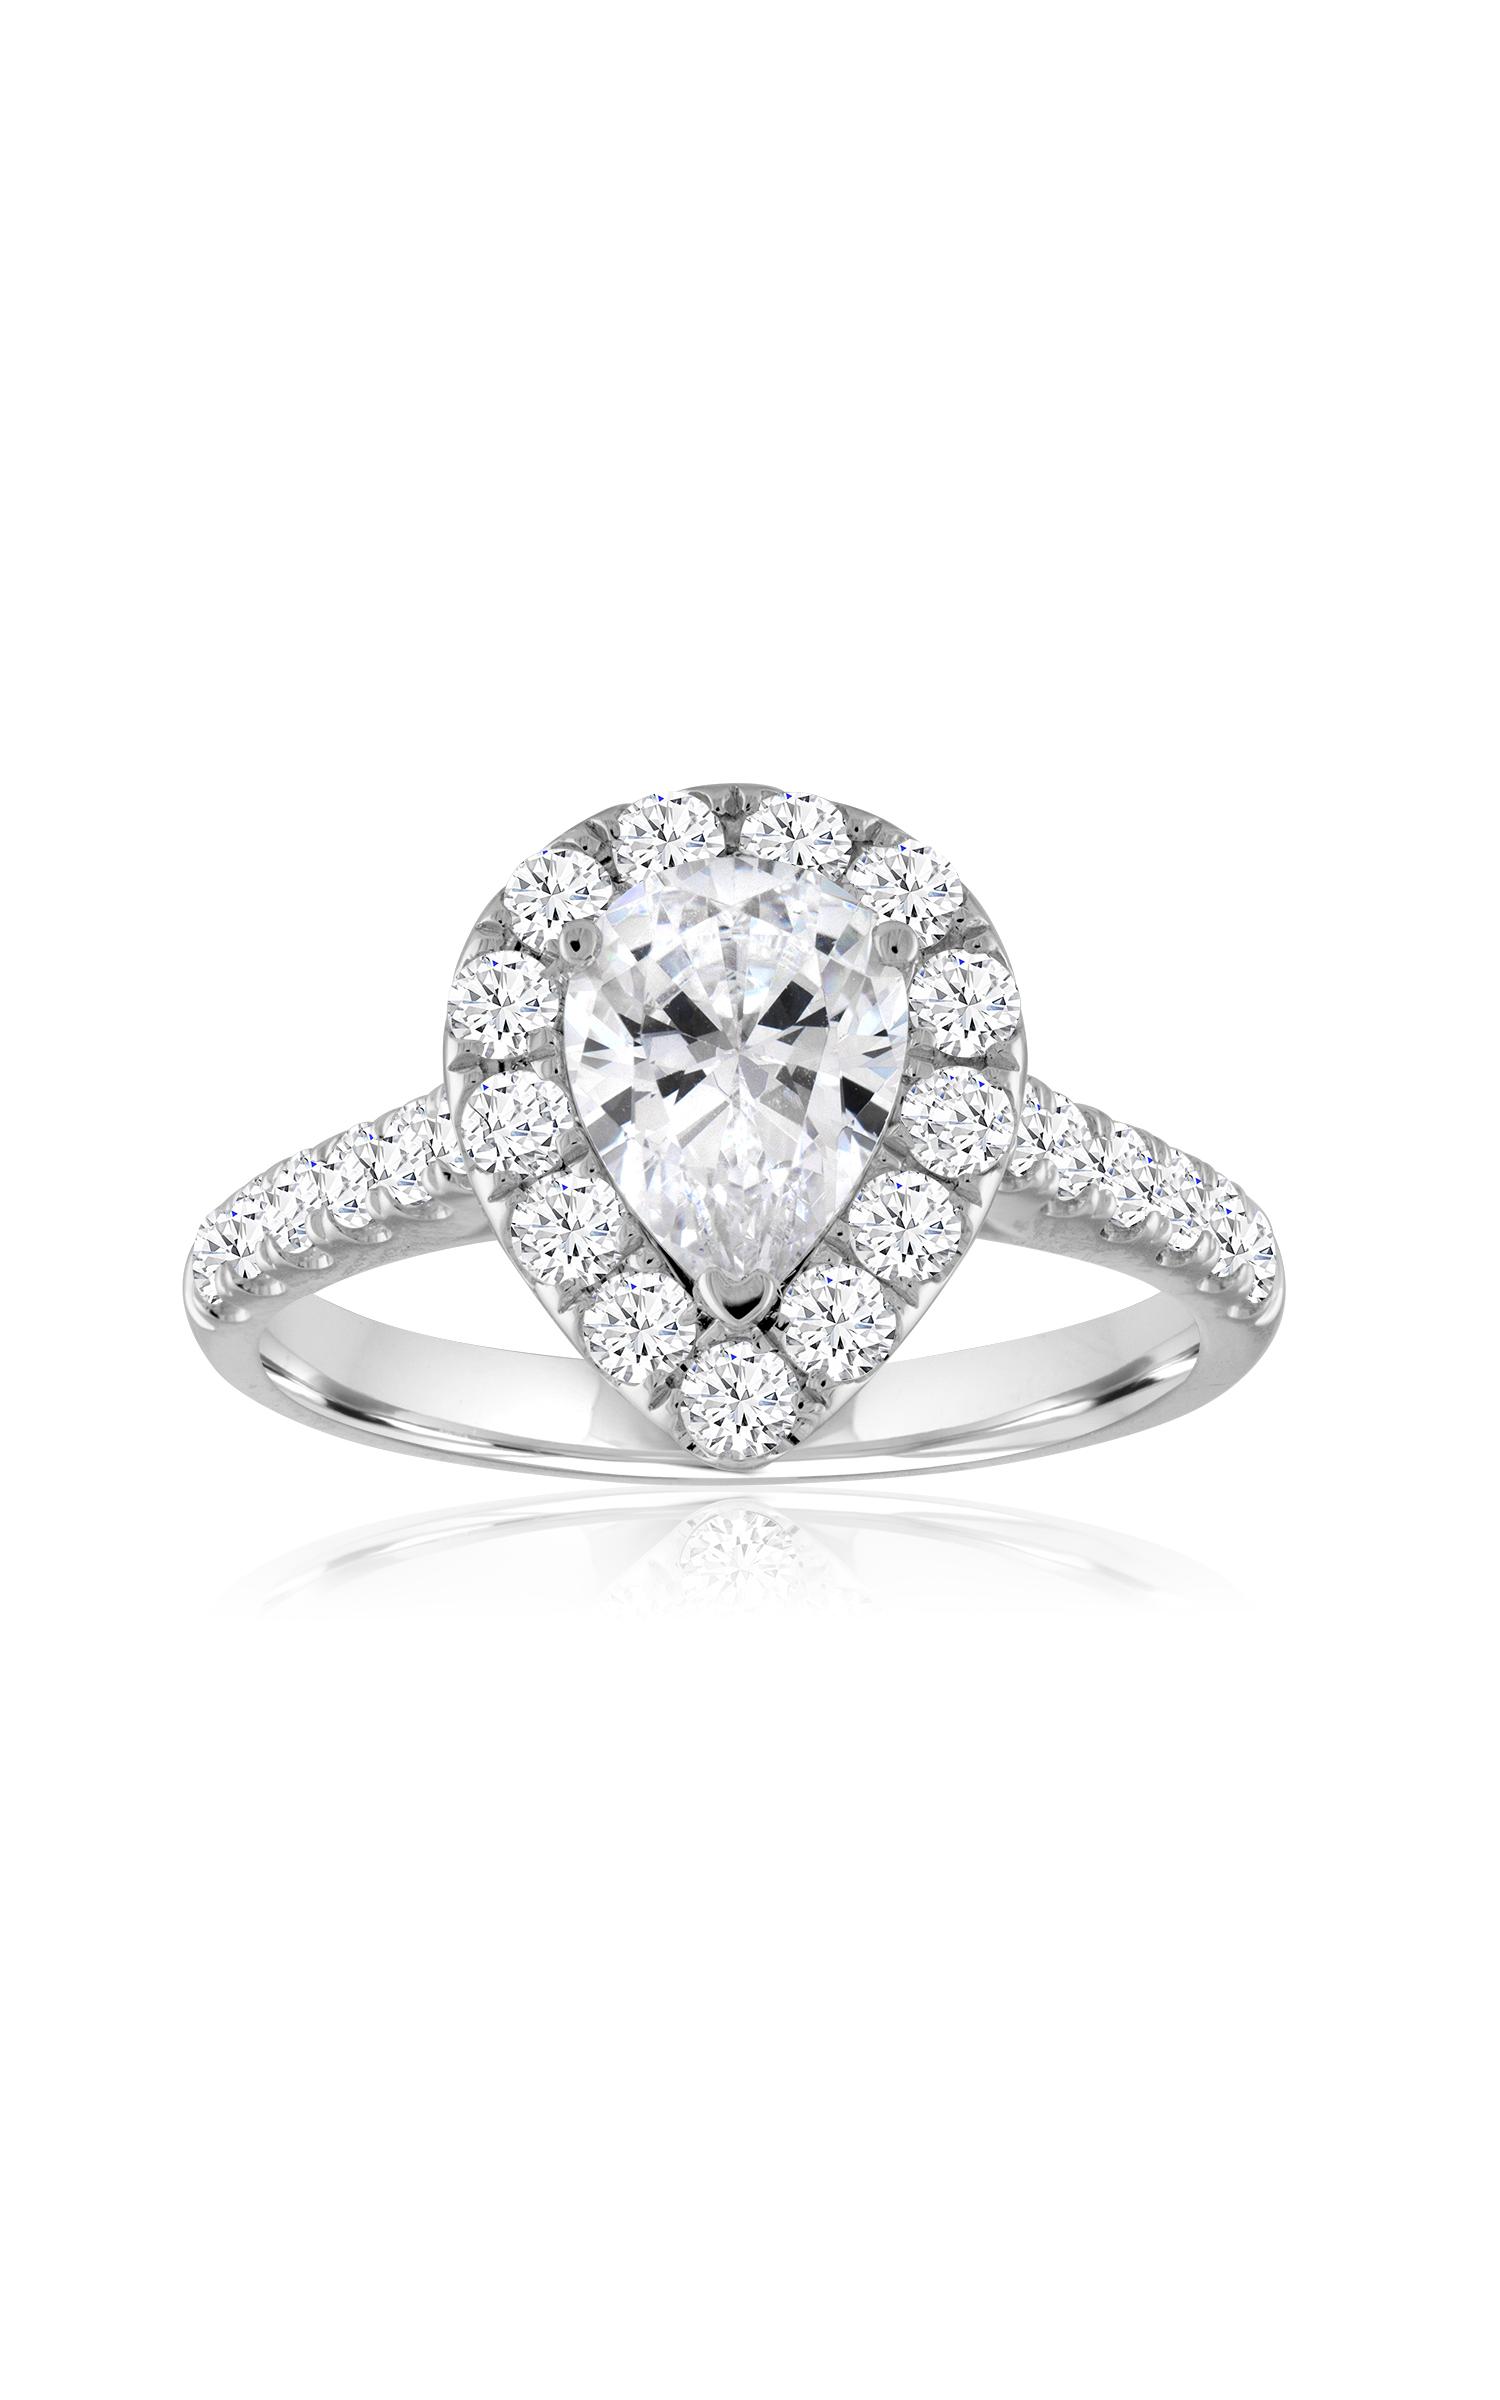 Imagine Bridal Engagement Ring 64256D-3/4 product image